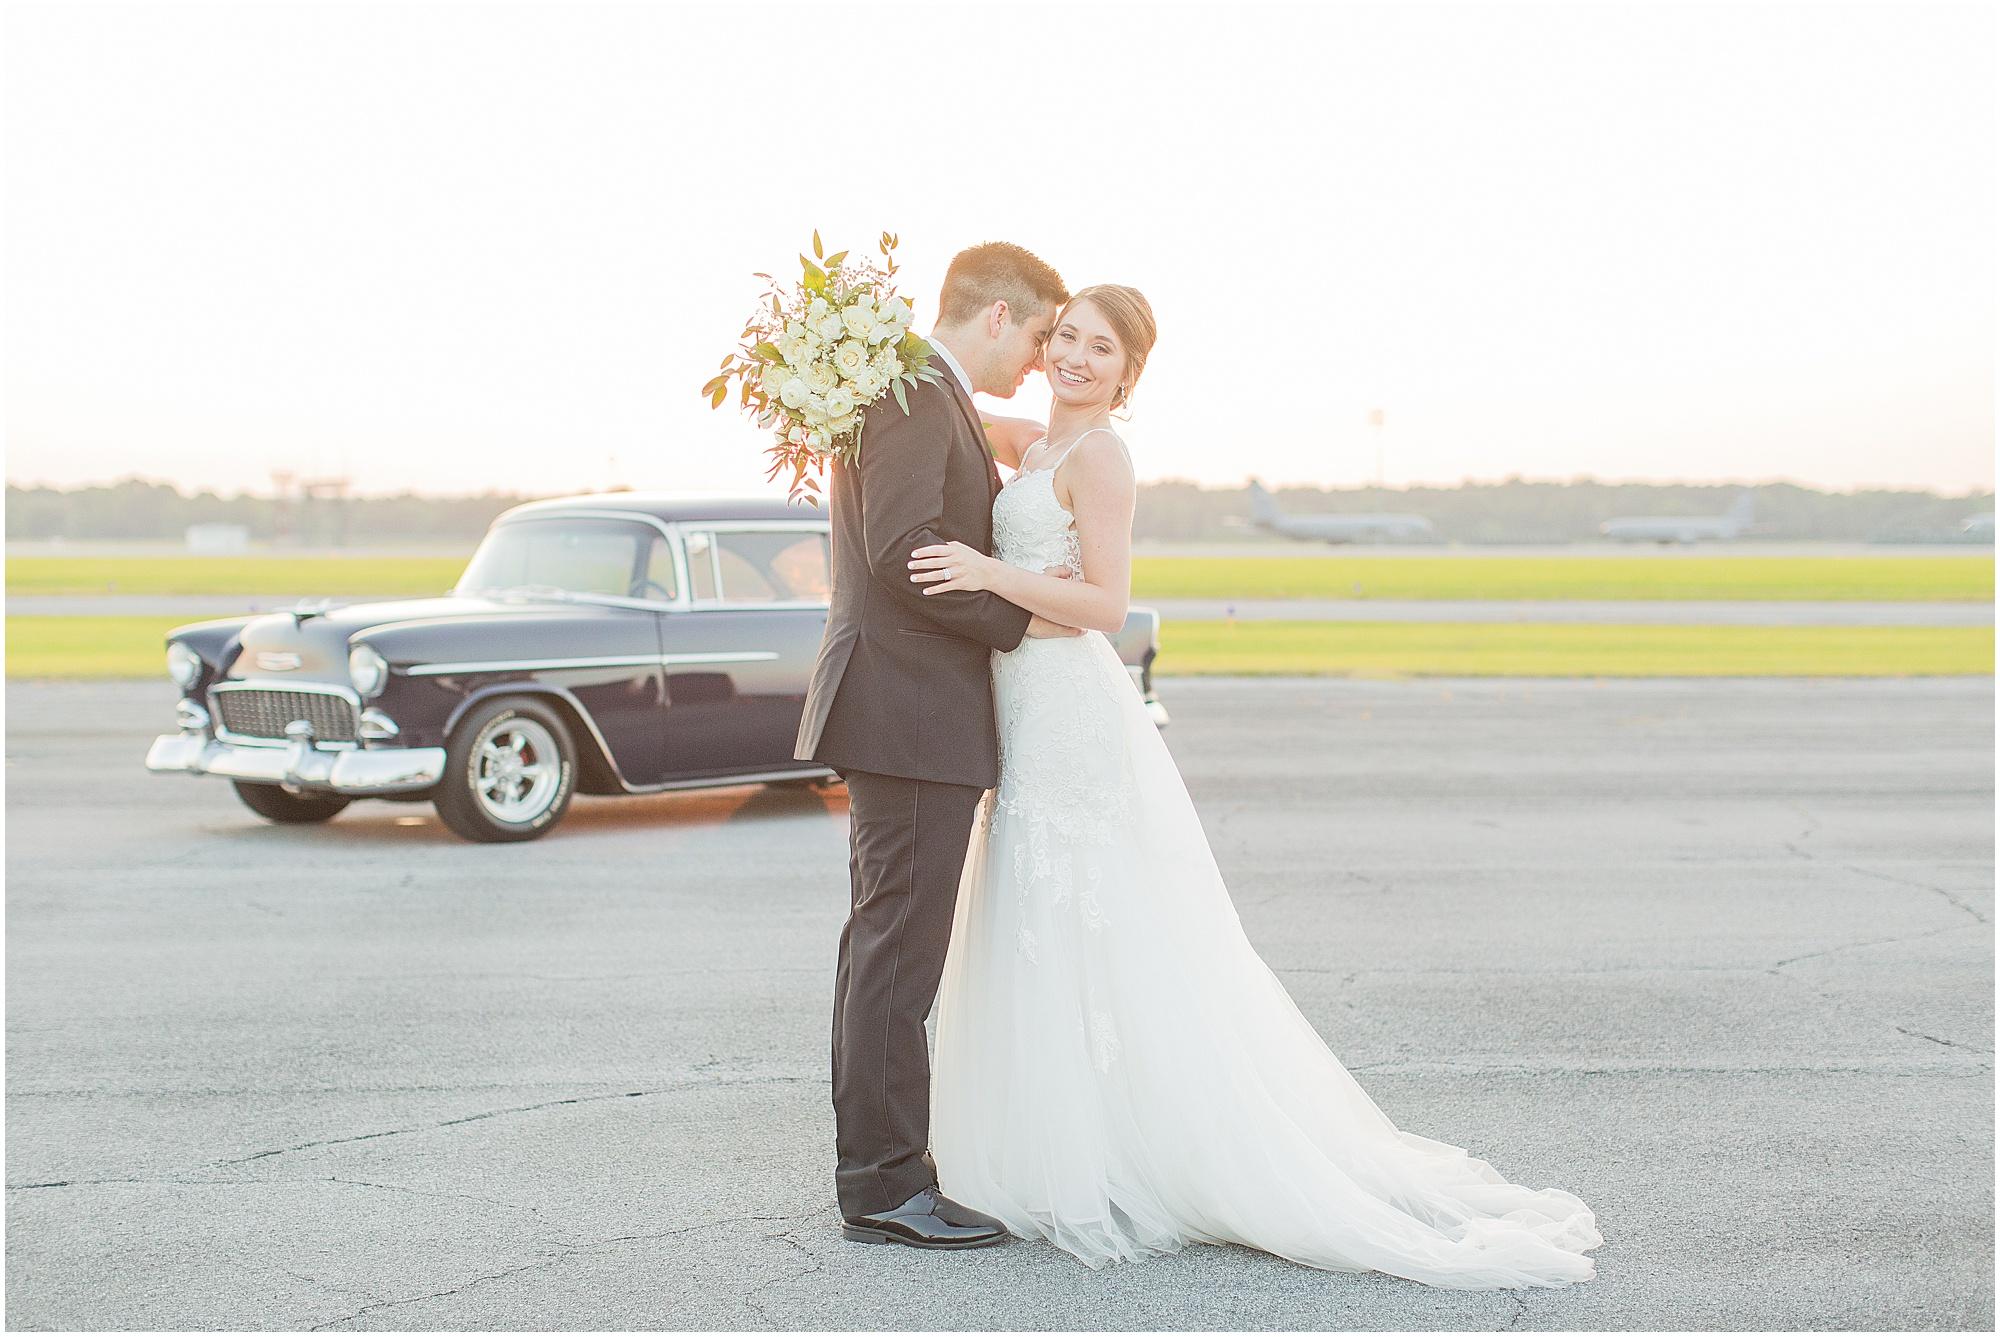 meridian-mississippi-wedding-meridian-aviation_0086.jpg